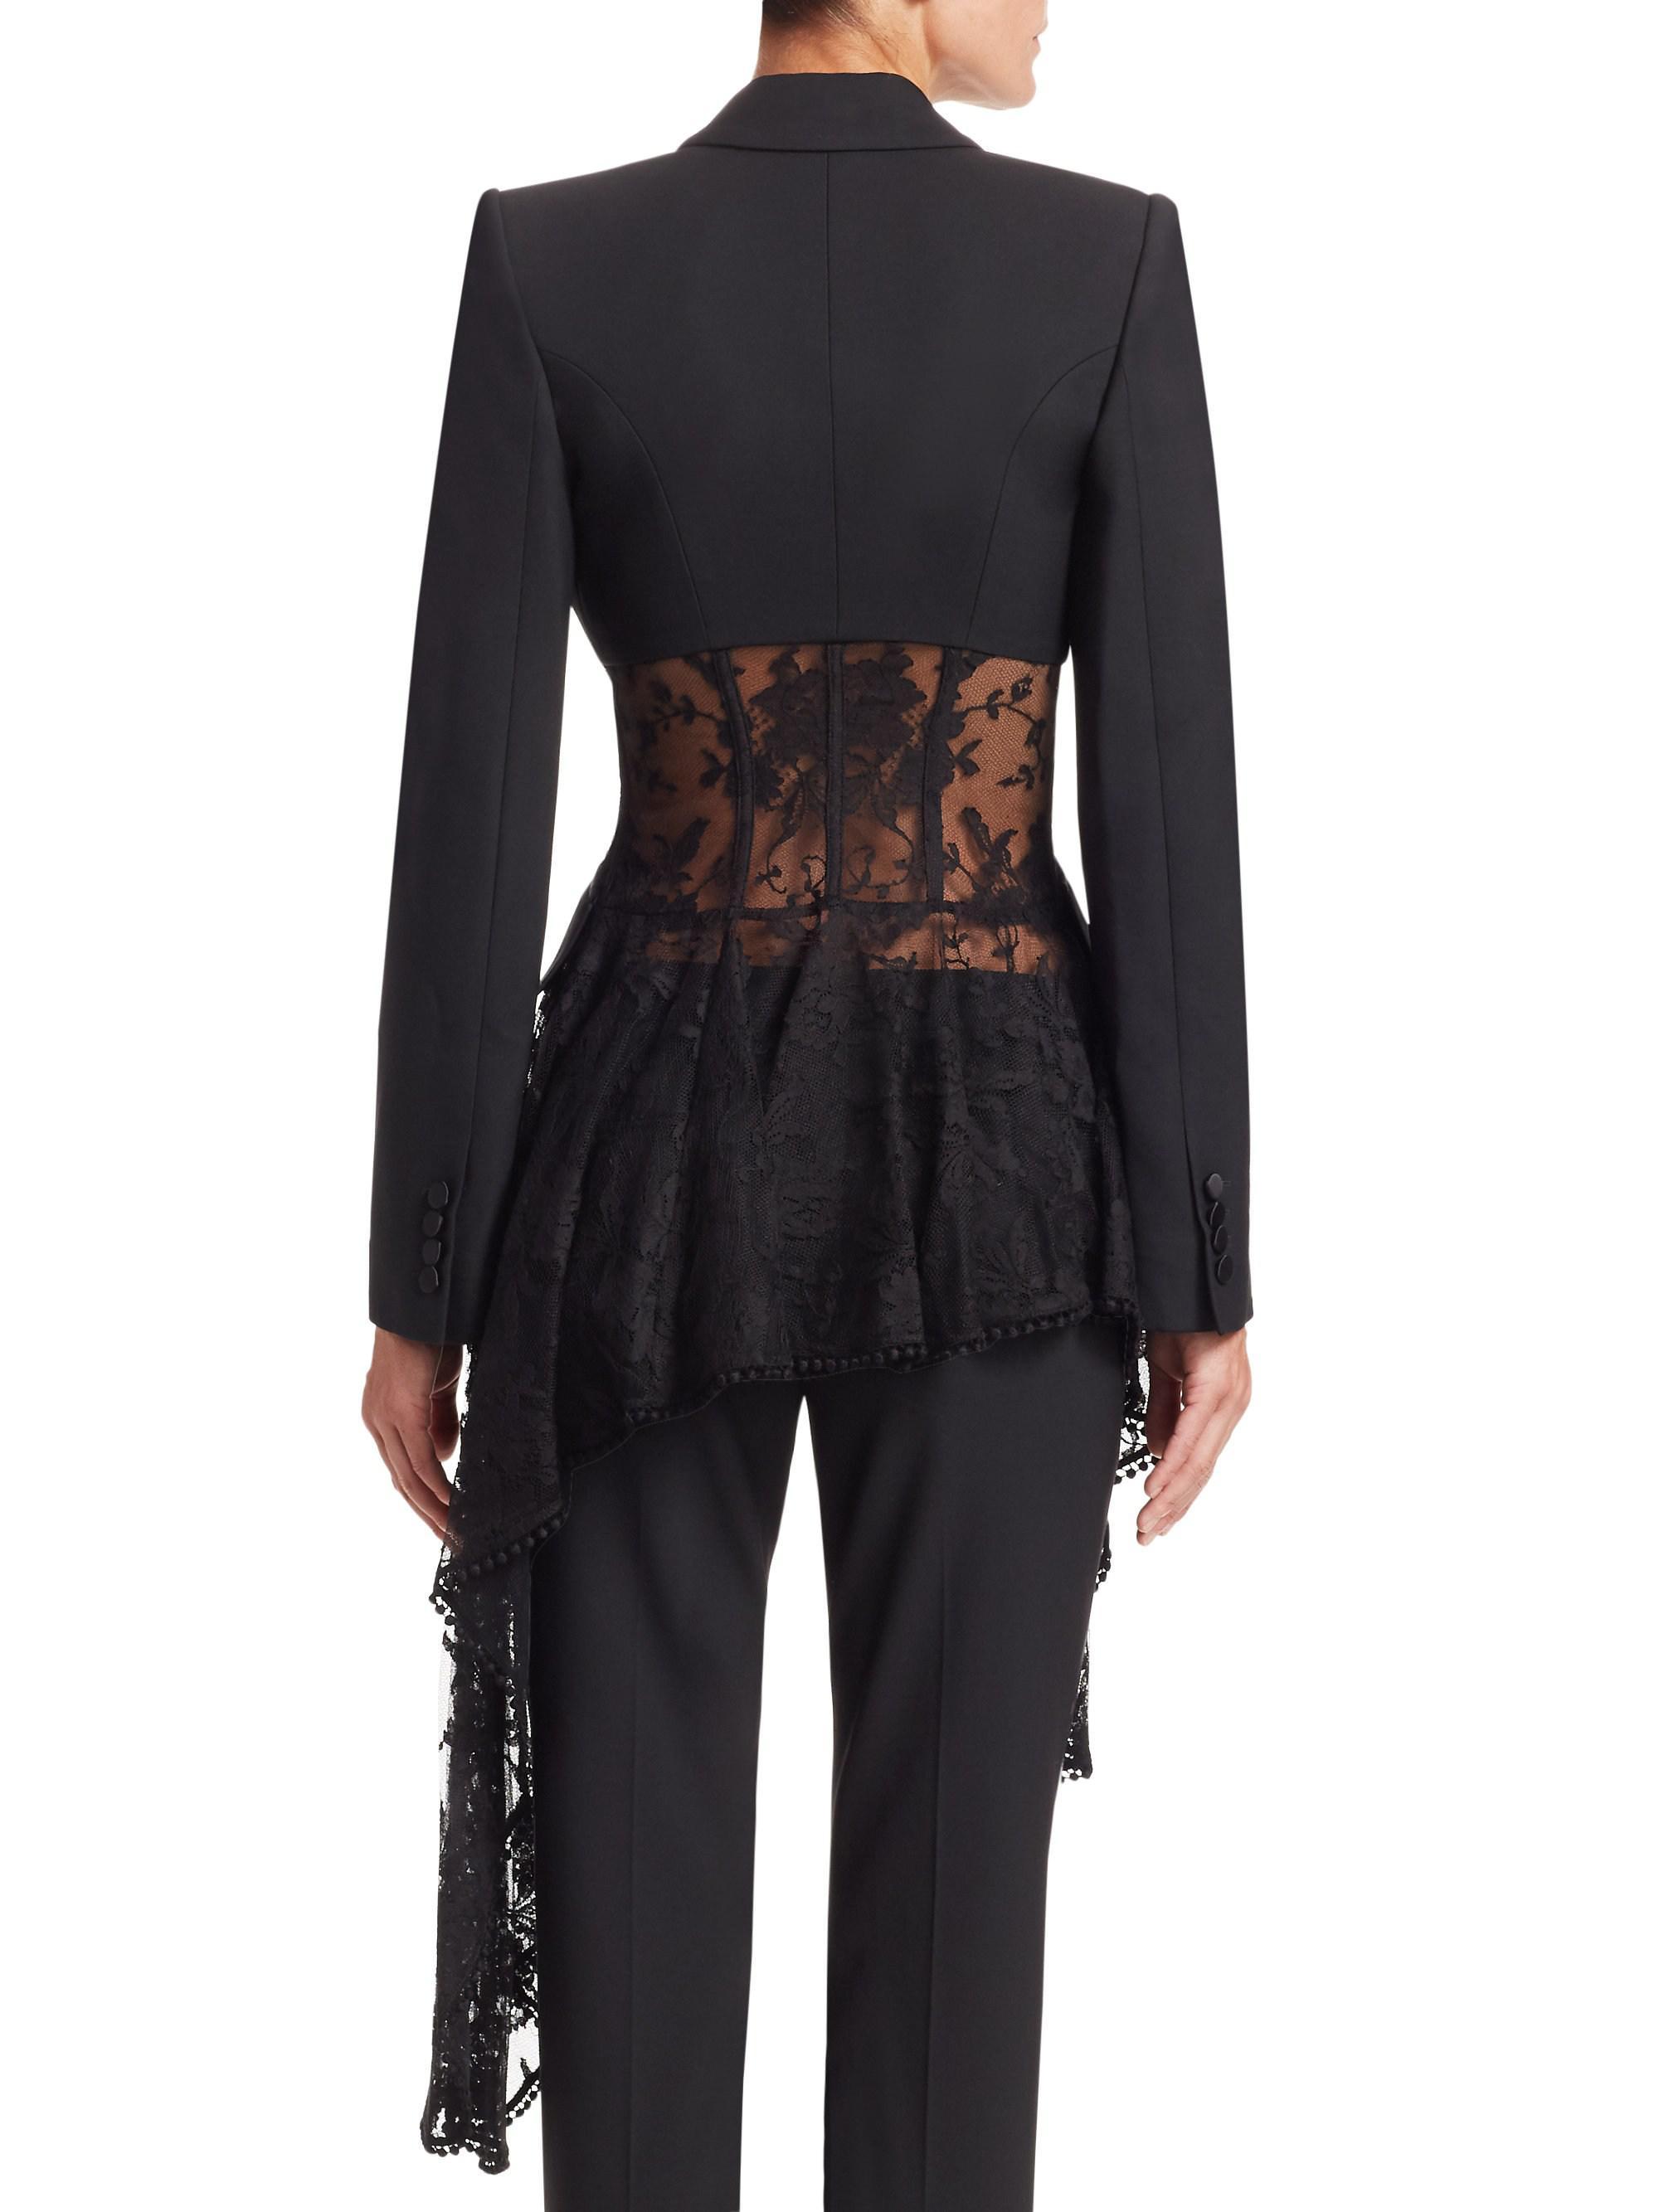 39005ee7f4 Lyst - Alexander McQueen Lace Drape Corset Jacket in Black